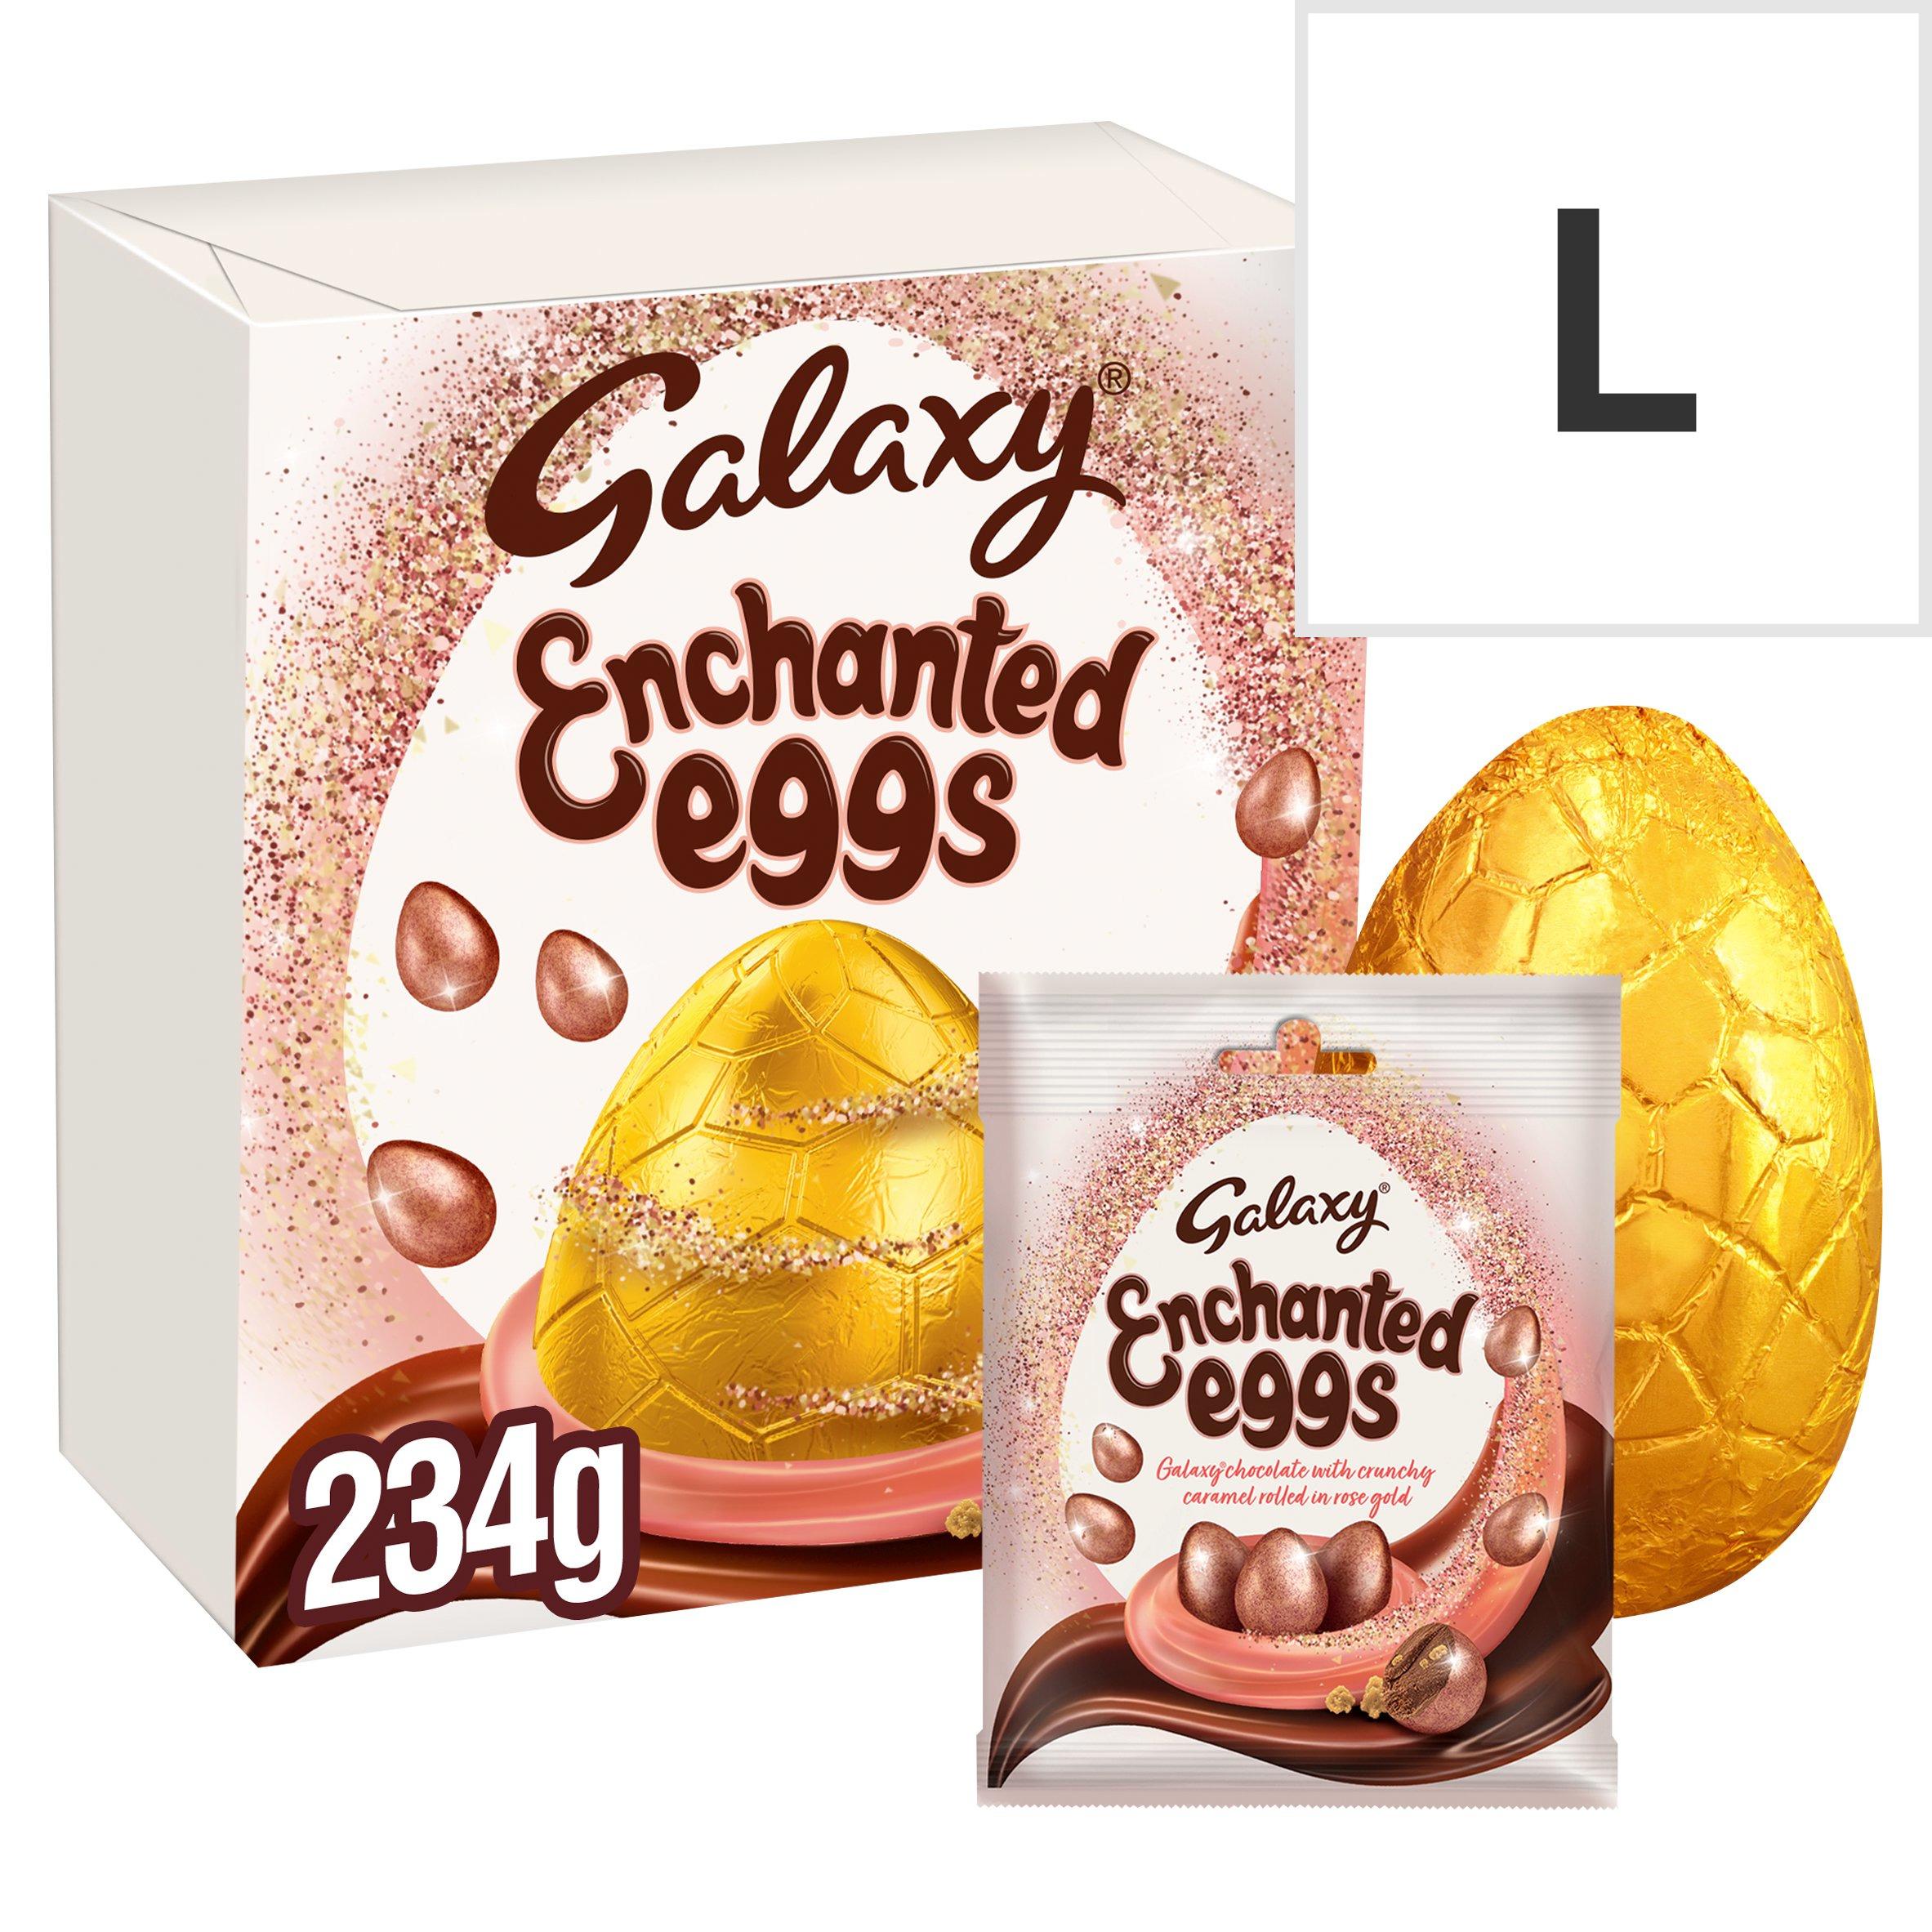 Galaxy Milk Chocolate Egg & Enchanted Milk Chocolate Eggs 234G